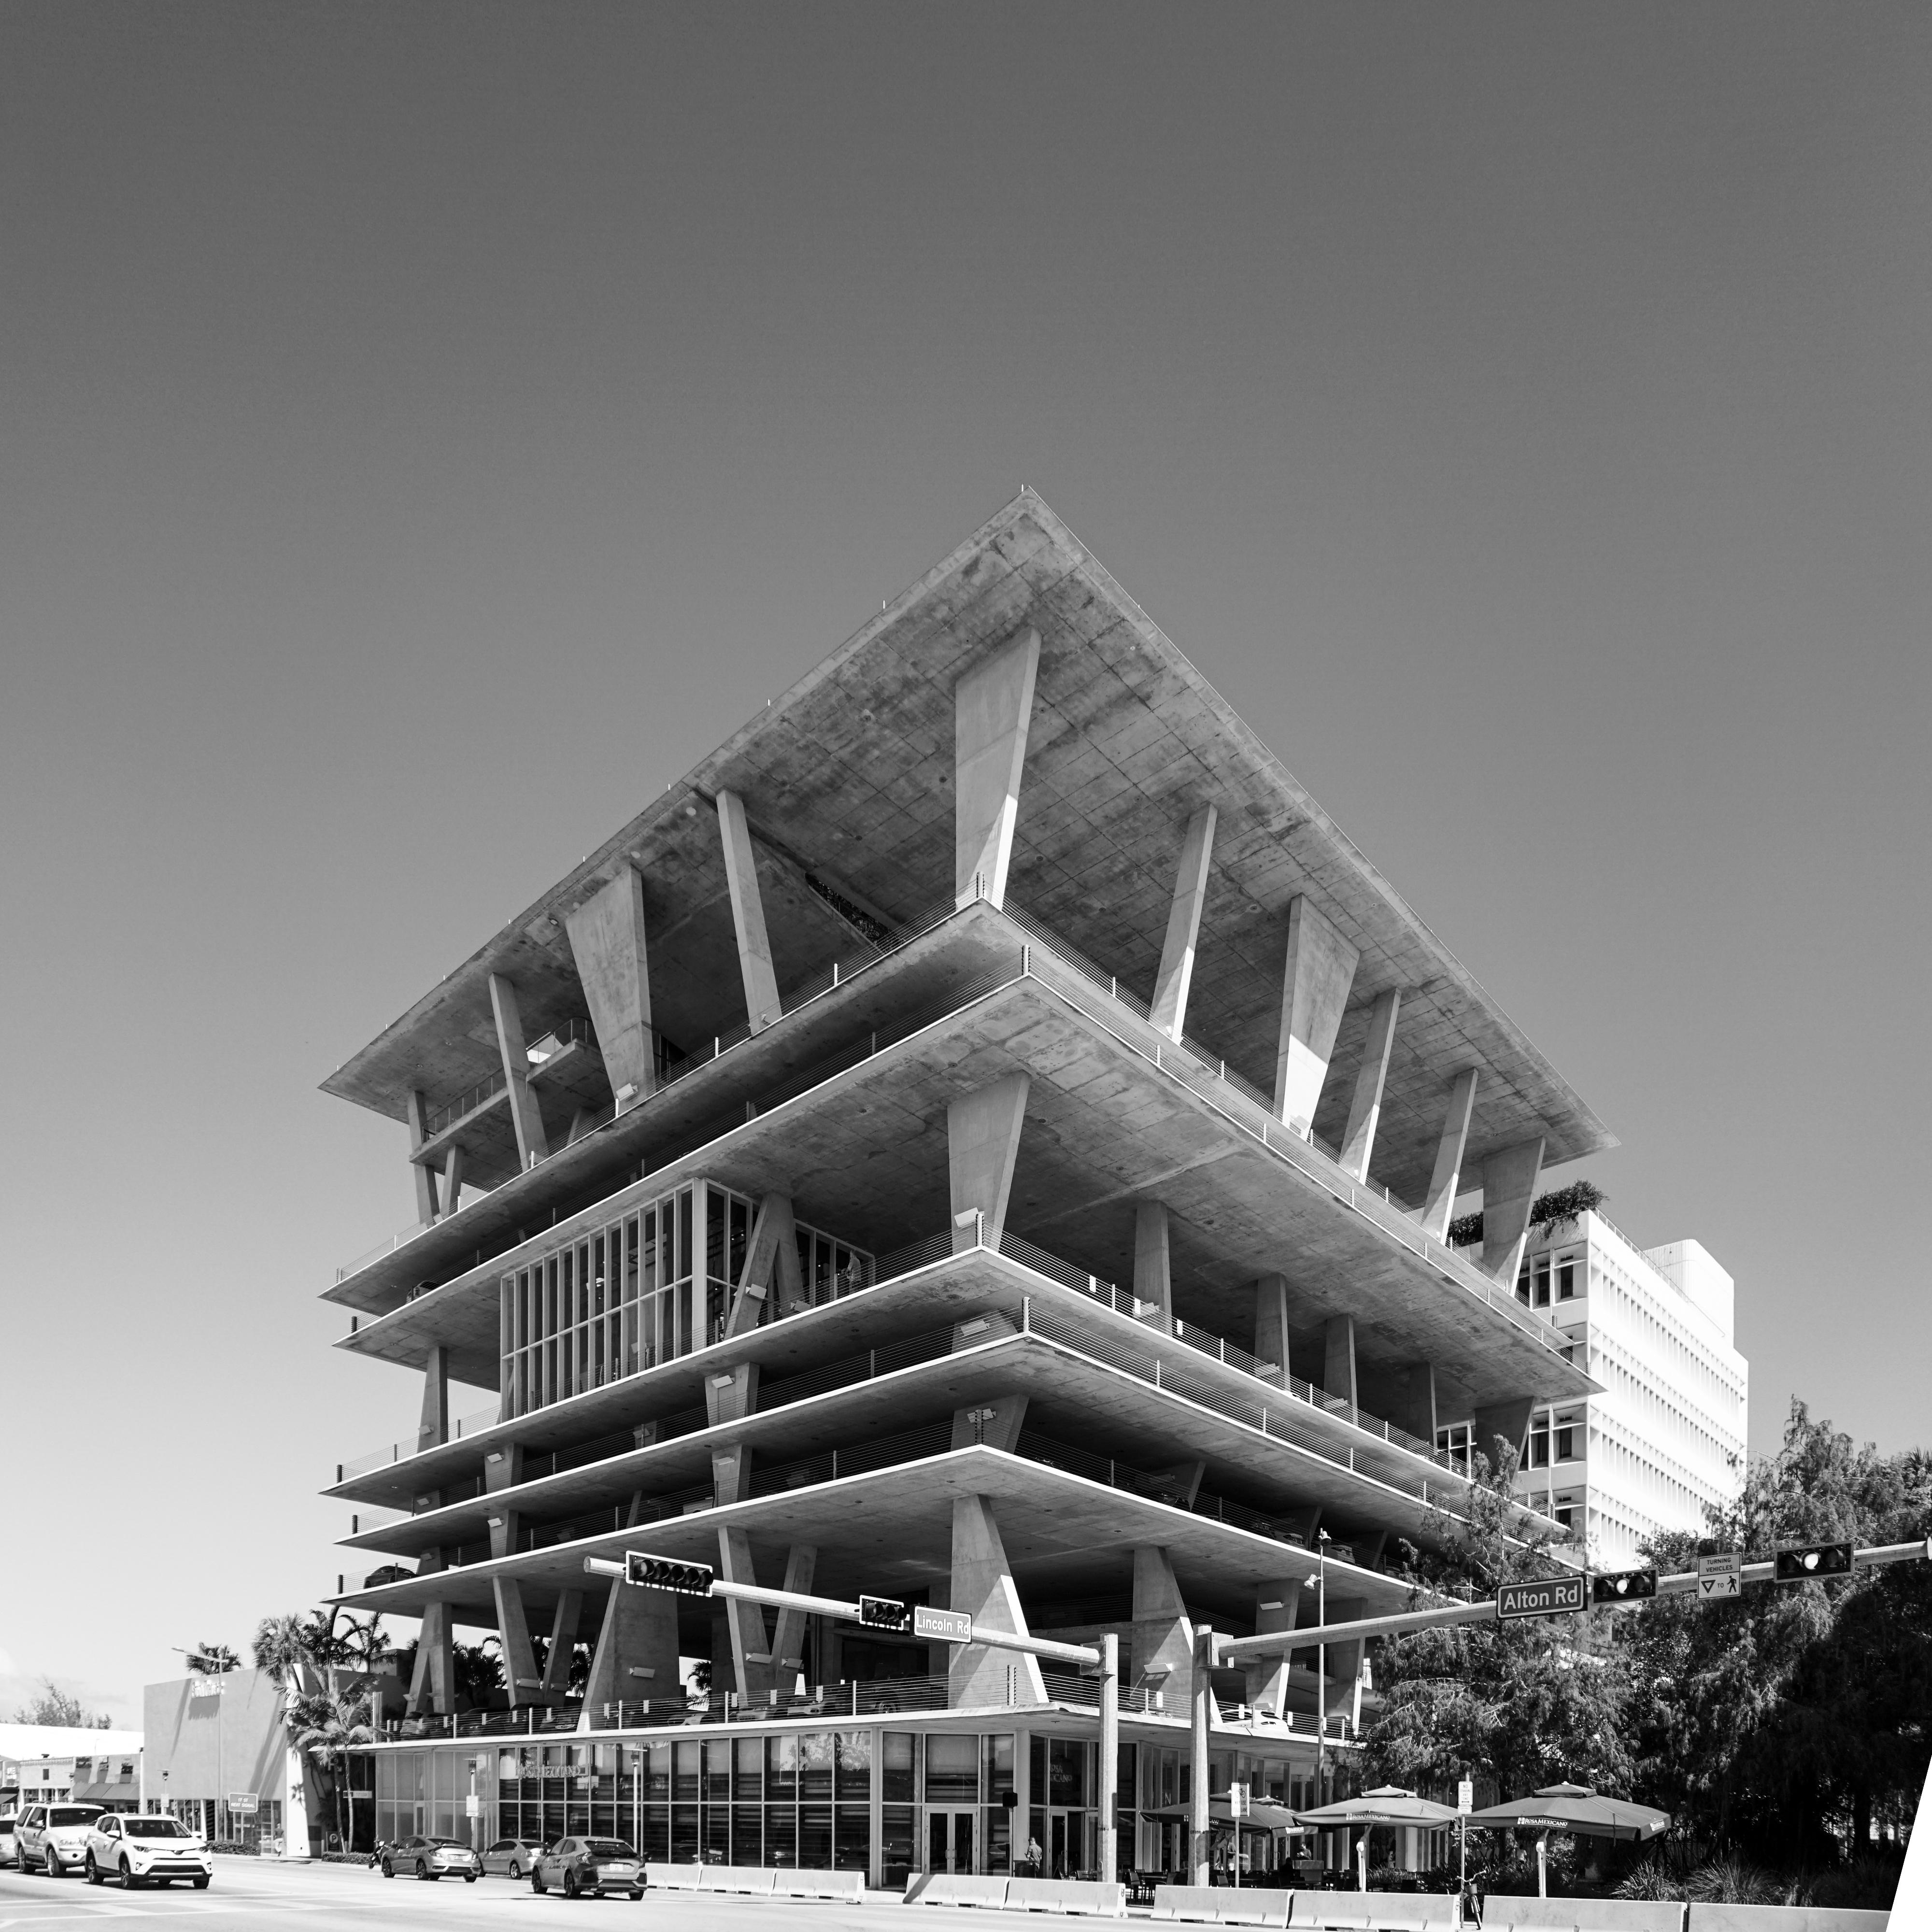 Miami Architecture Building Black And White Monochrome Photography Landmark Structure